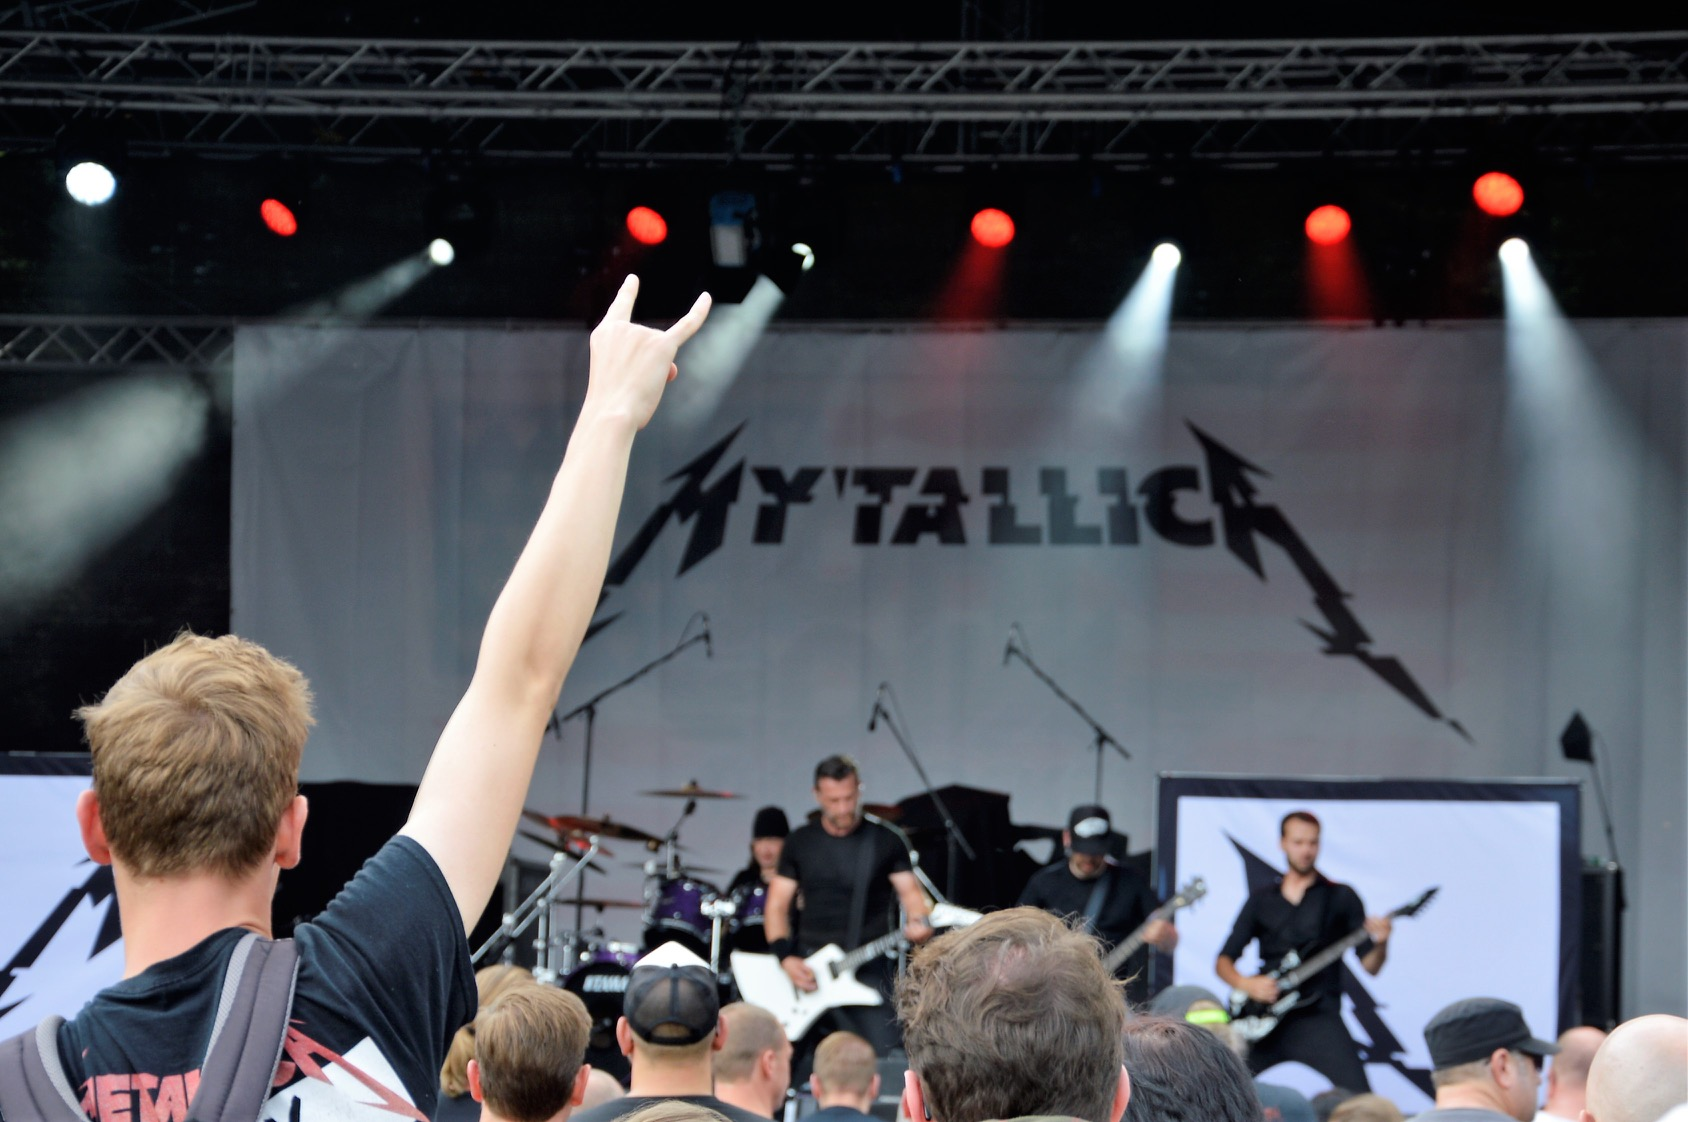 mytallica-dortmund-rock-n-tribute-festival-2017-stage-horns-hand